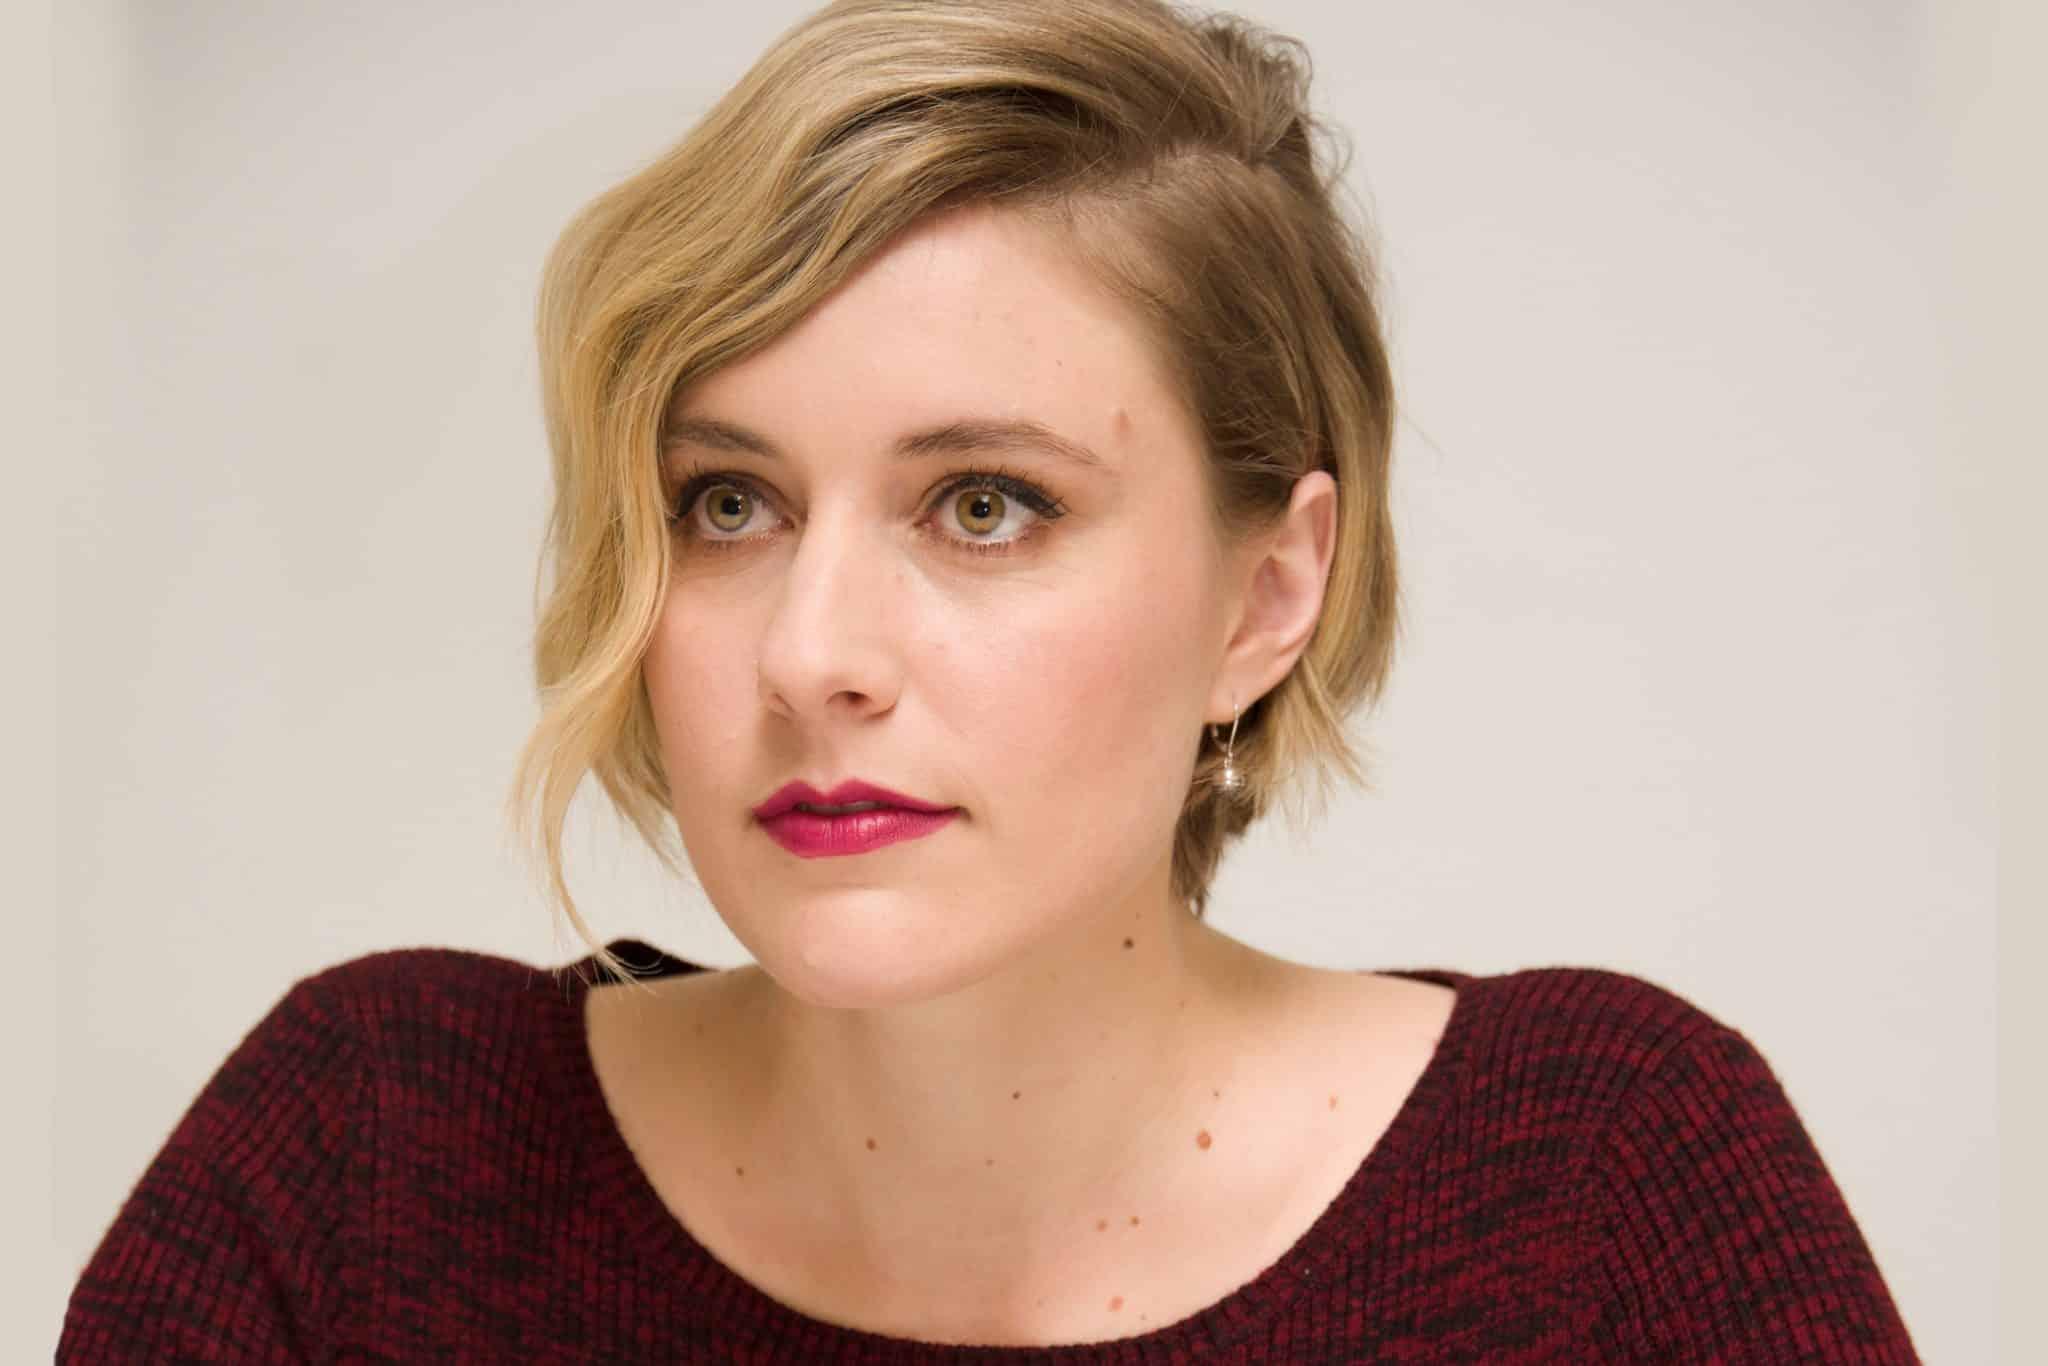 Režisérka Greta Gerwig pripravuje nový film Little Women